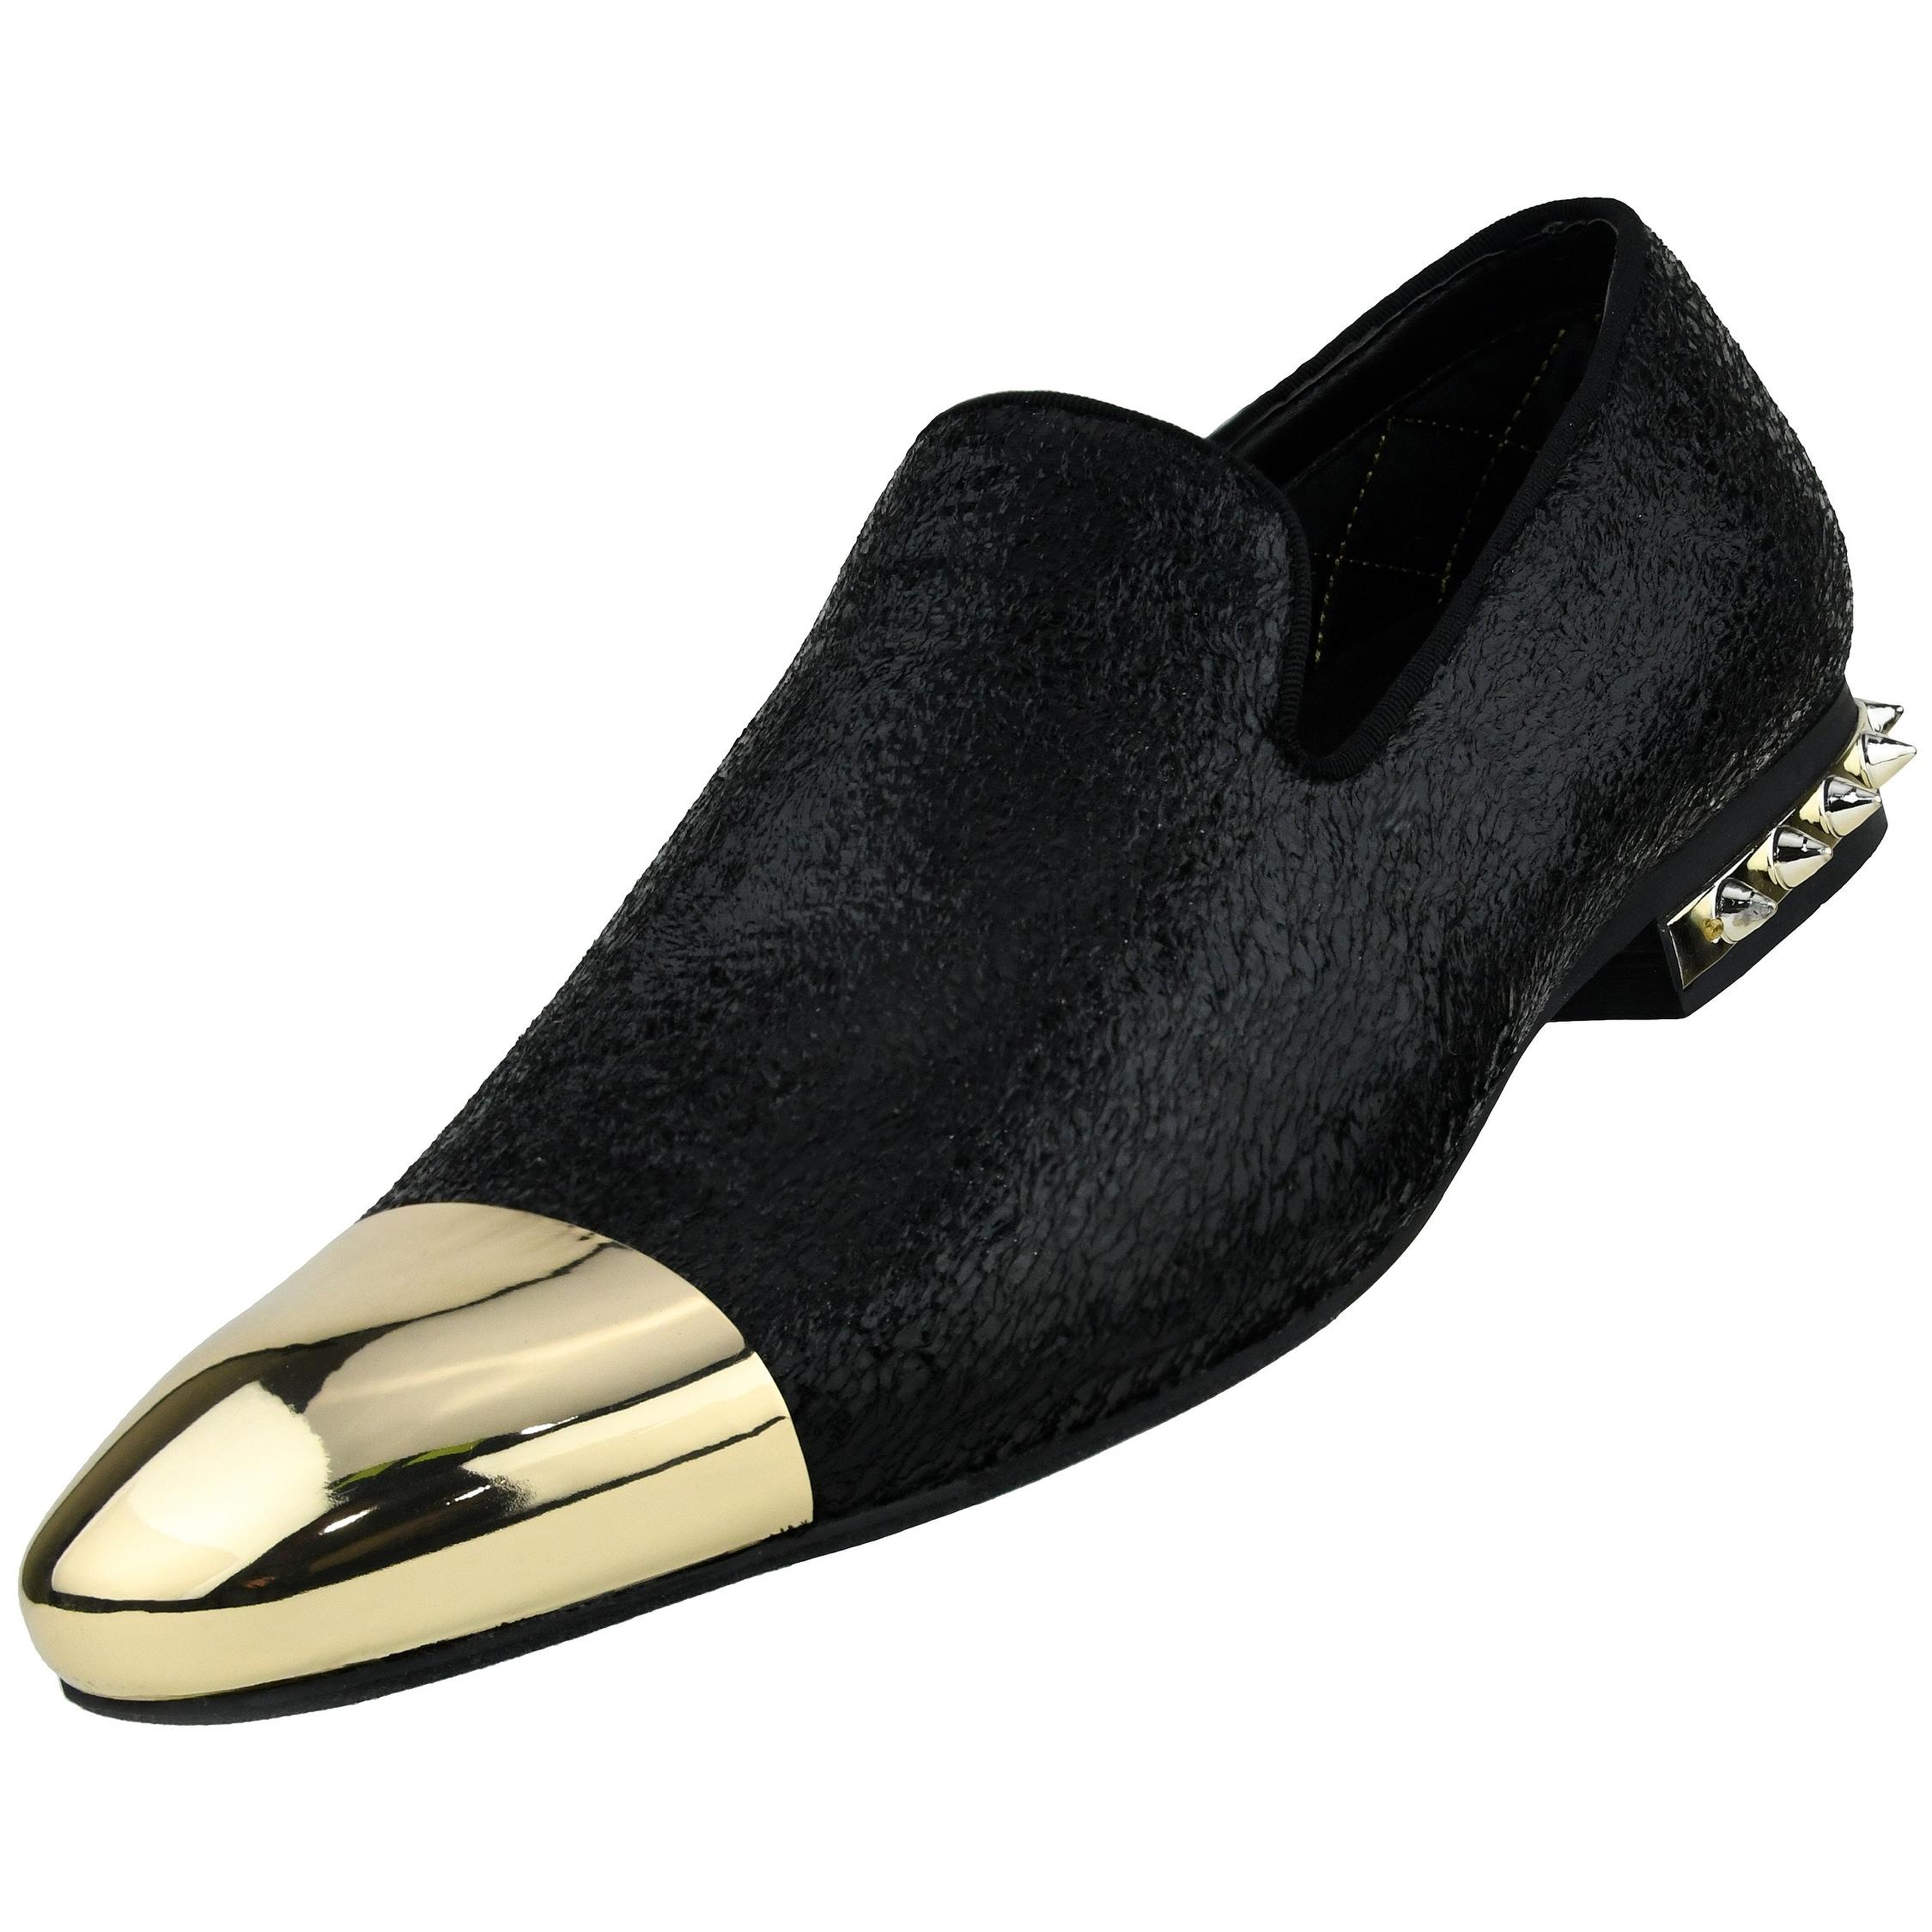 5a440b5aee71 Shop Amali Men's Crinkle Metallic Smoking Slipper Dress Shoe, Style ...